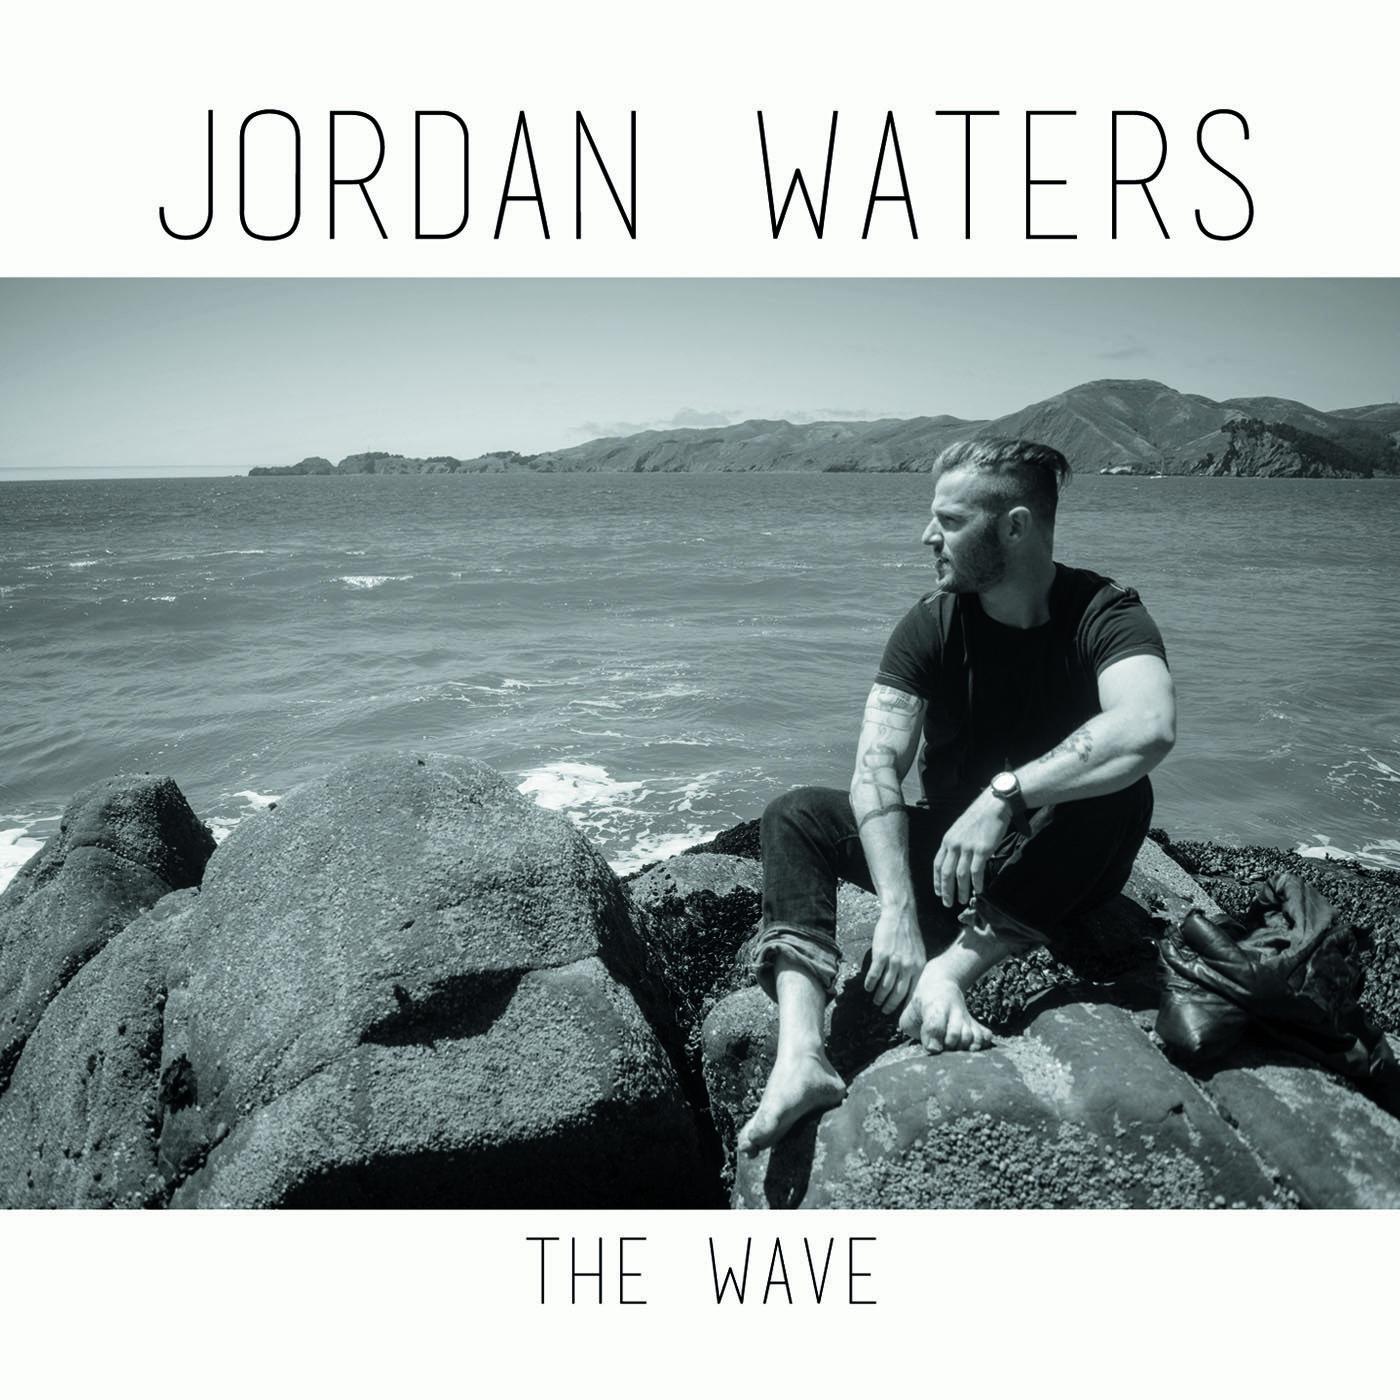 The Wave - CD Album QYYSBEU263UY4C5OSGXAN4JT